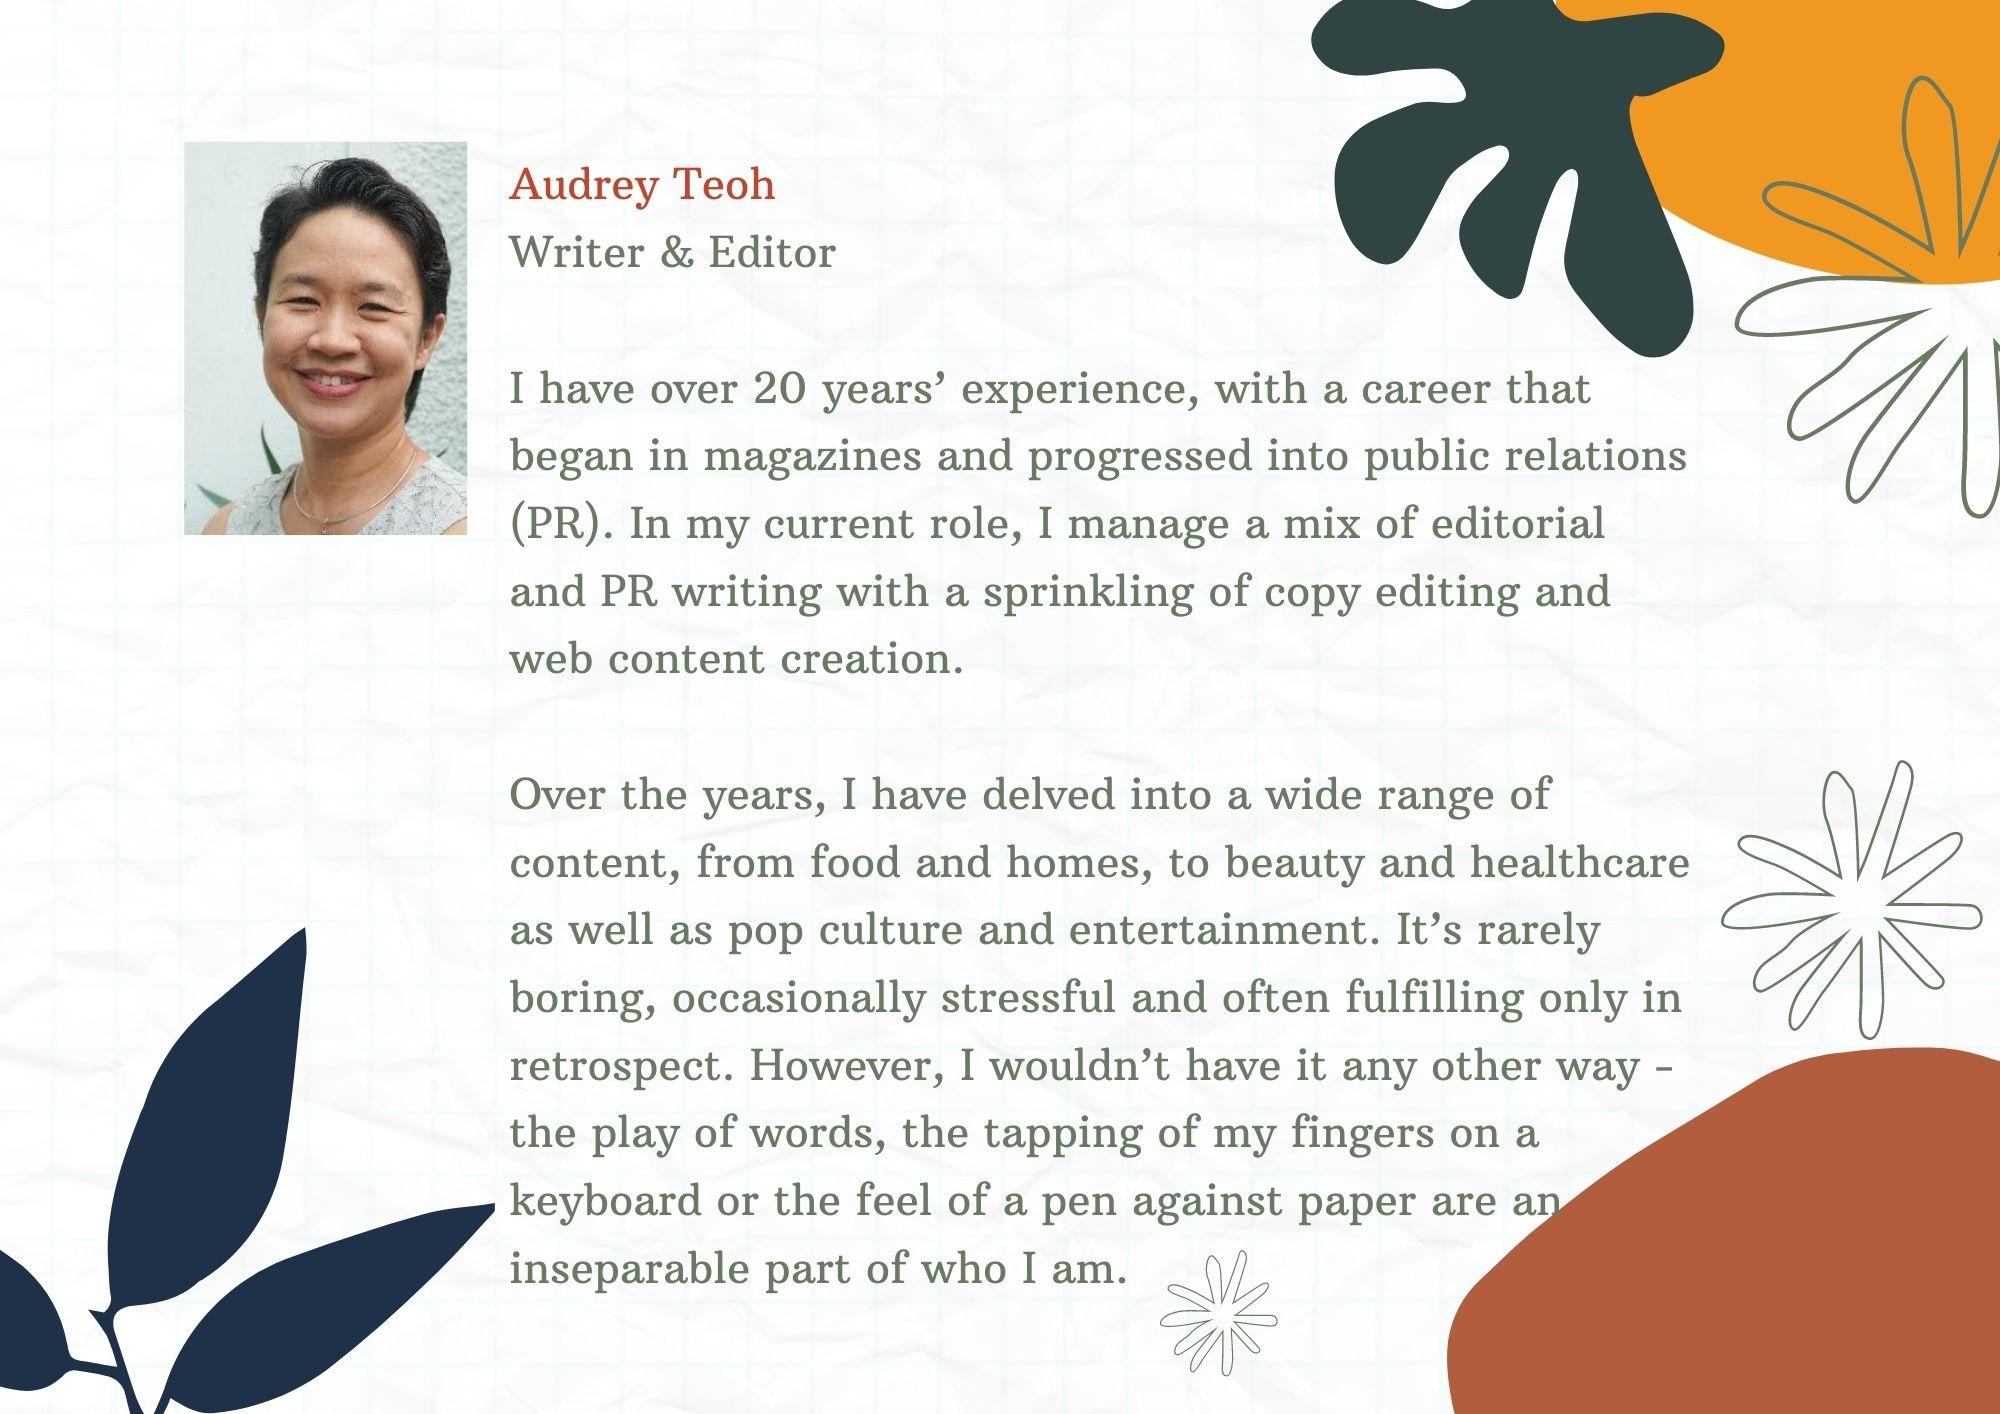 audrey teoh PR writing copy editing